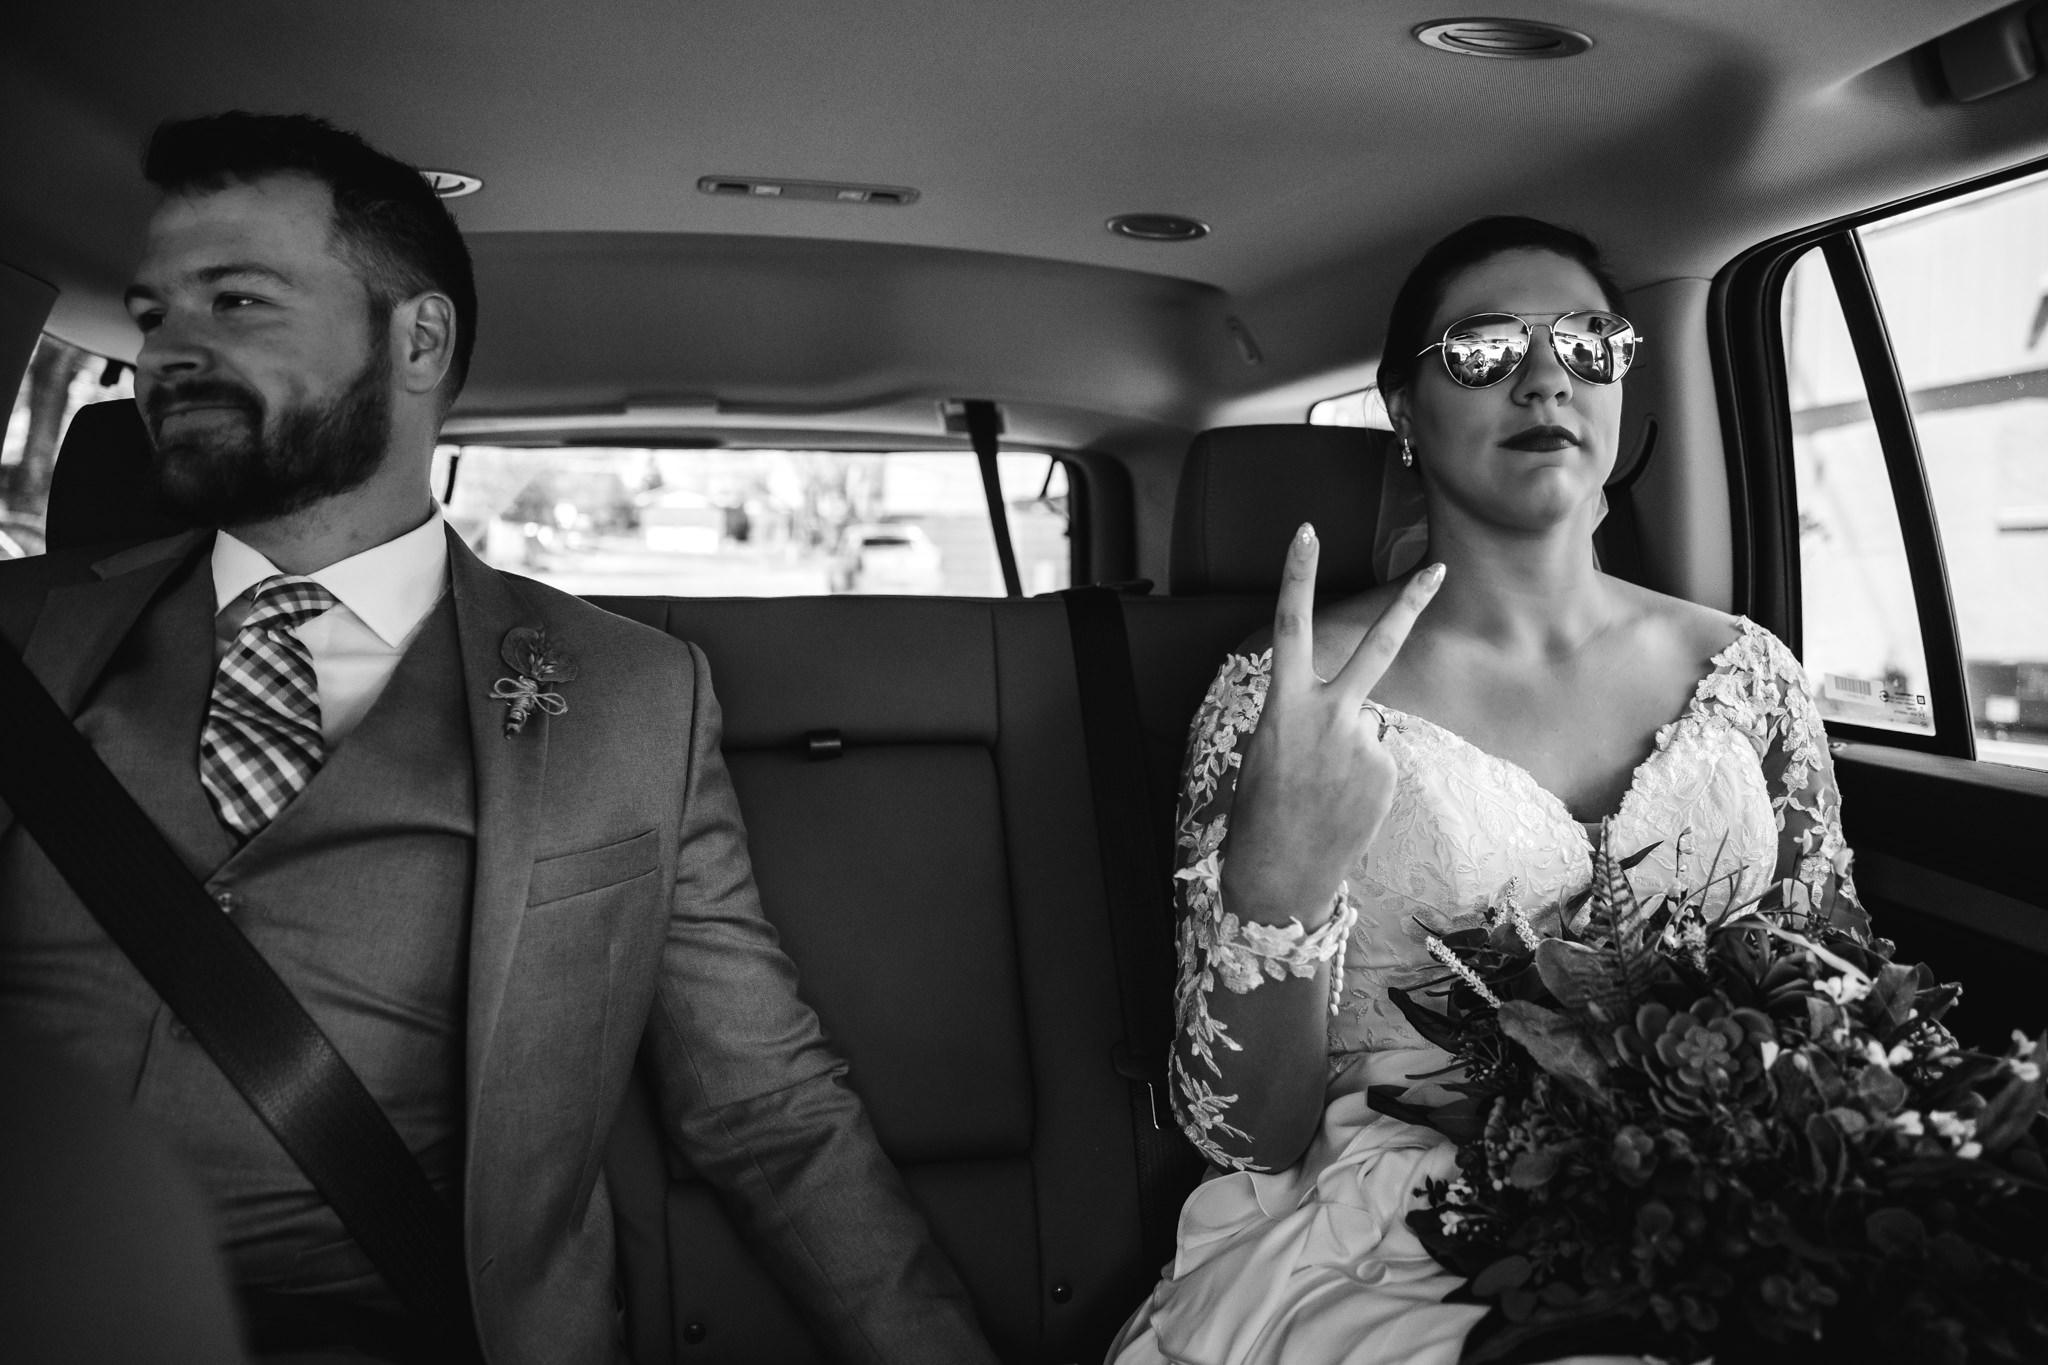 phantom-canyon-brewery-colorado-springs-wedding-photographer-95.jpg